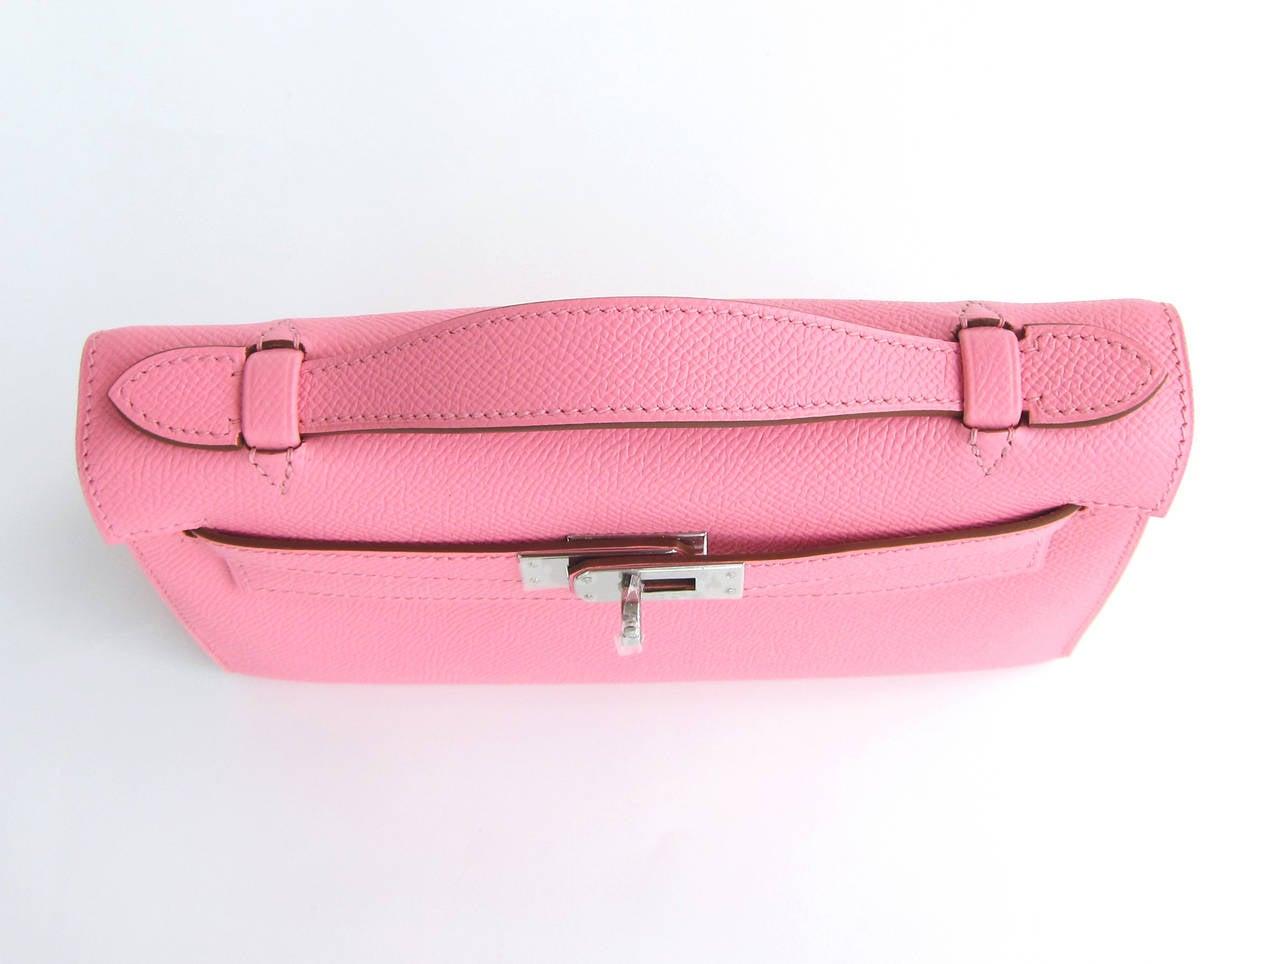 Hermes Rose Confetti Epsom Kelly Pochette Pink Clutch Bag Love For Sale 3